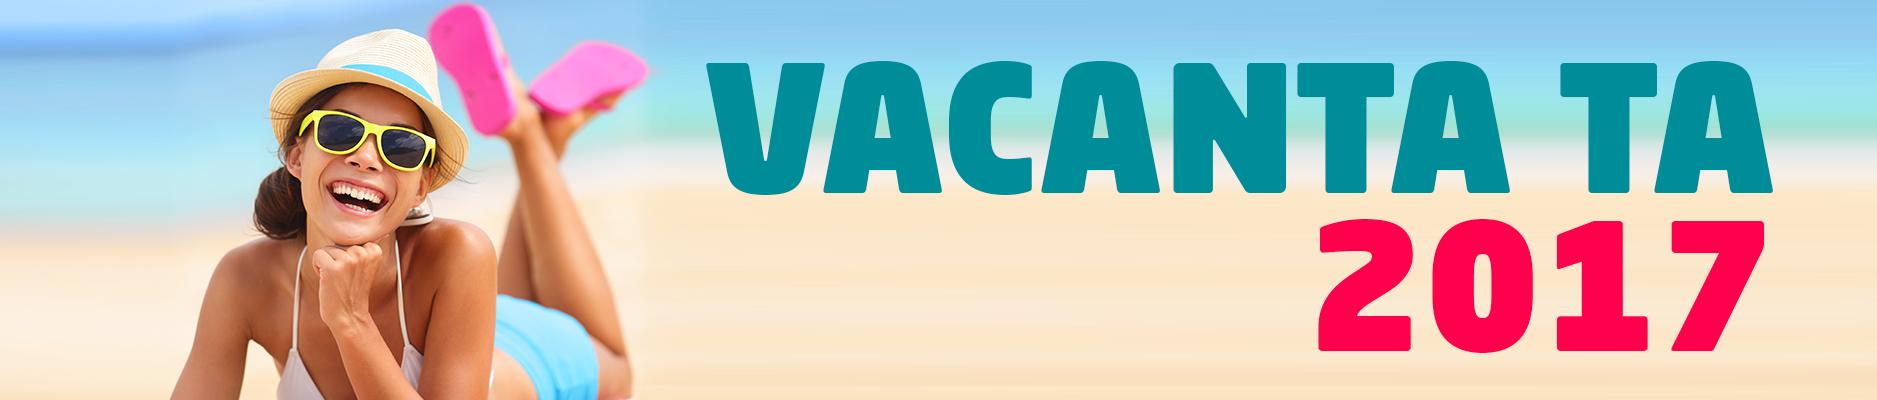 Oferte Vacanta 2017 - Excursii ieftine - Low Cost